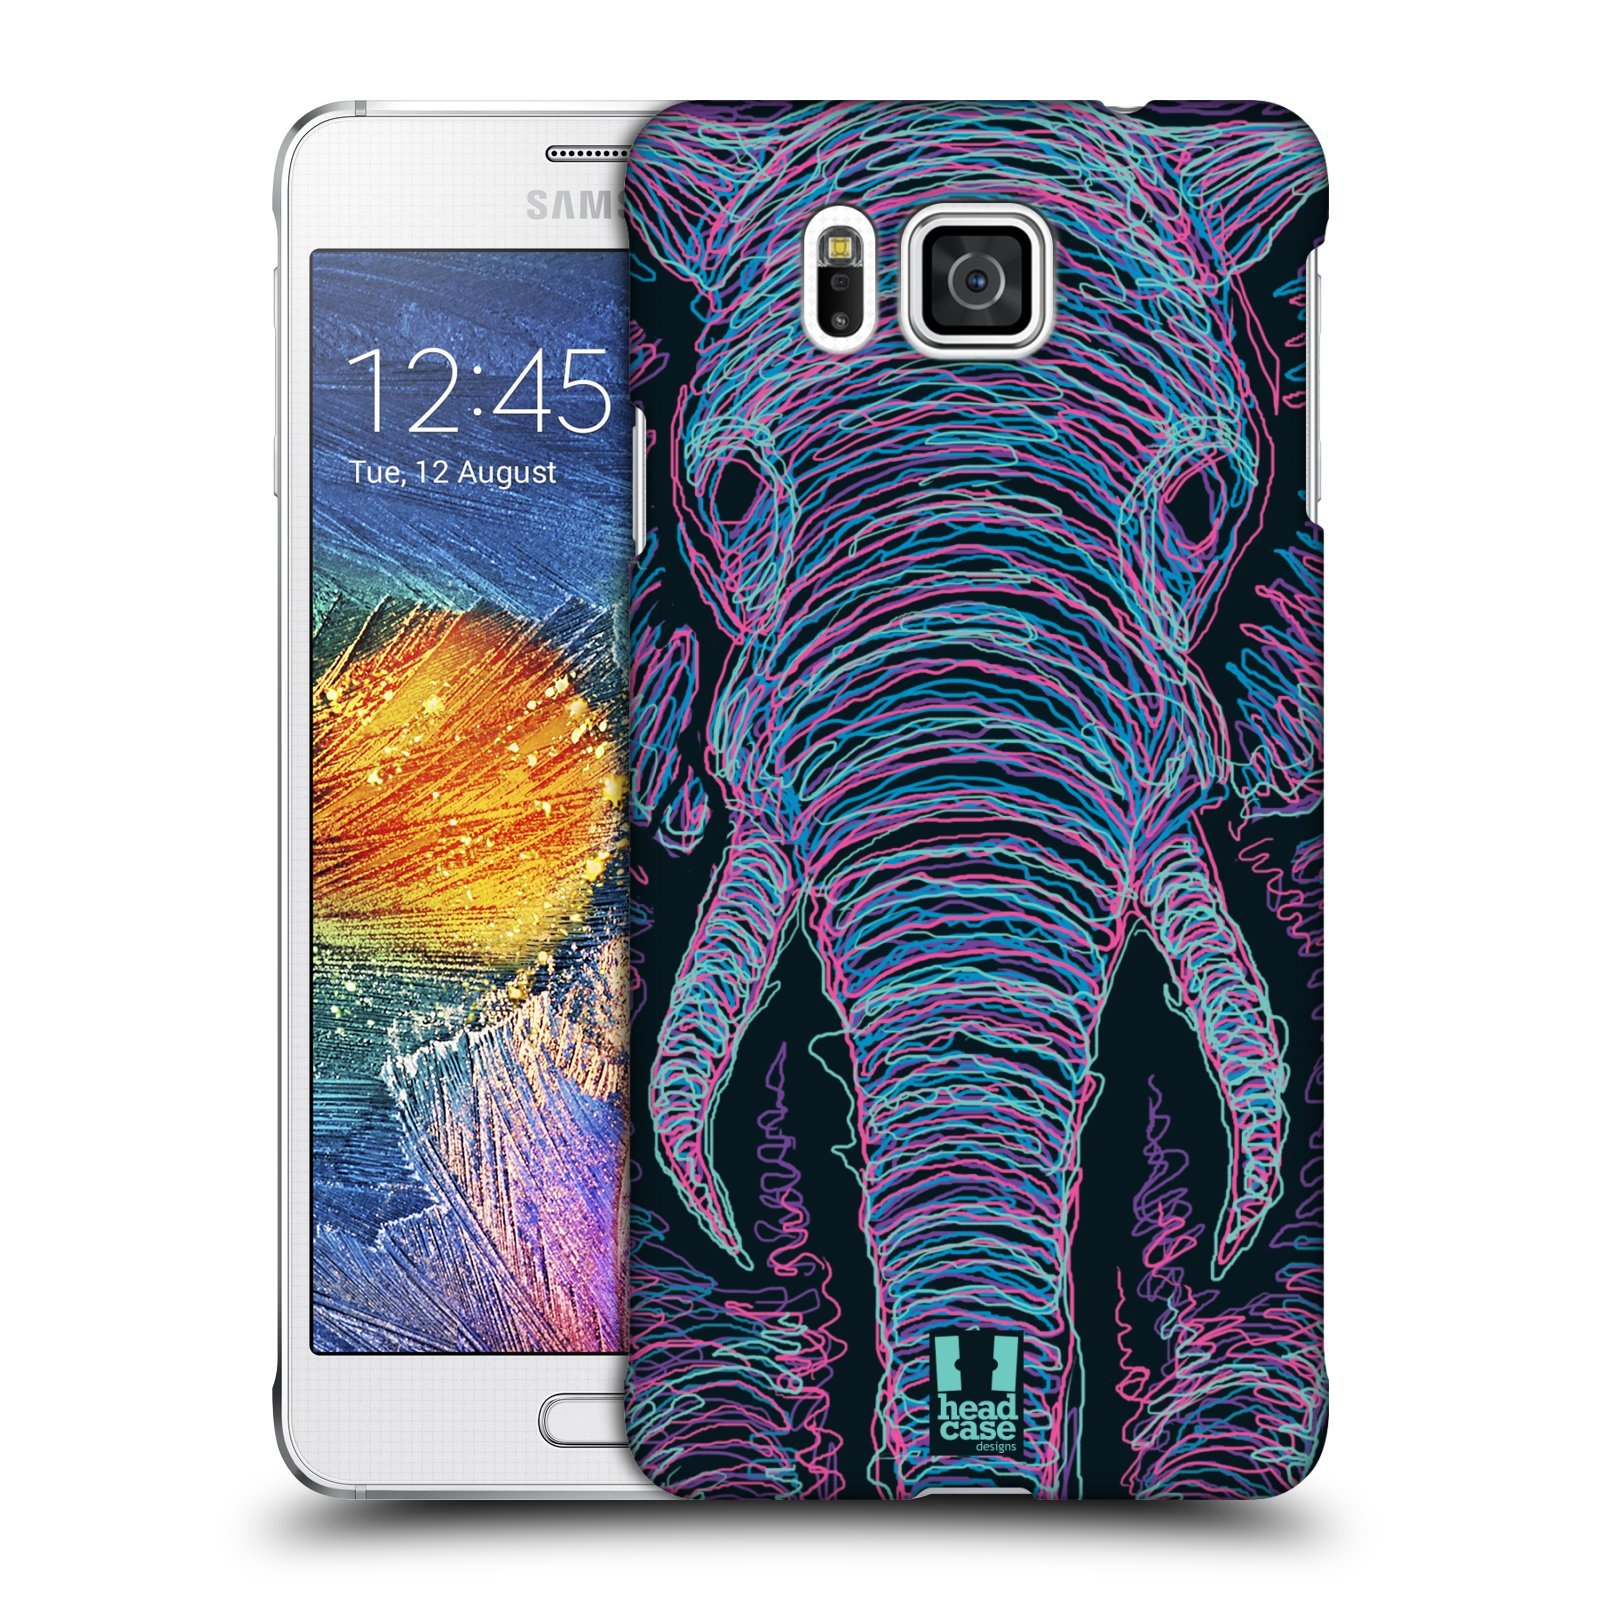 HEAD CASE plastový obal na mobil SAMSUNG Galaxy Alpha (G850) vzor zvíře čmáranice slon